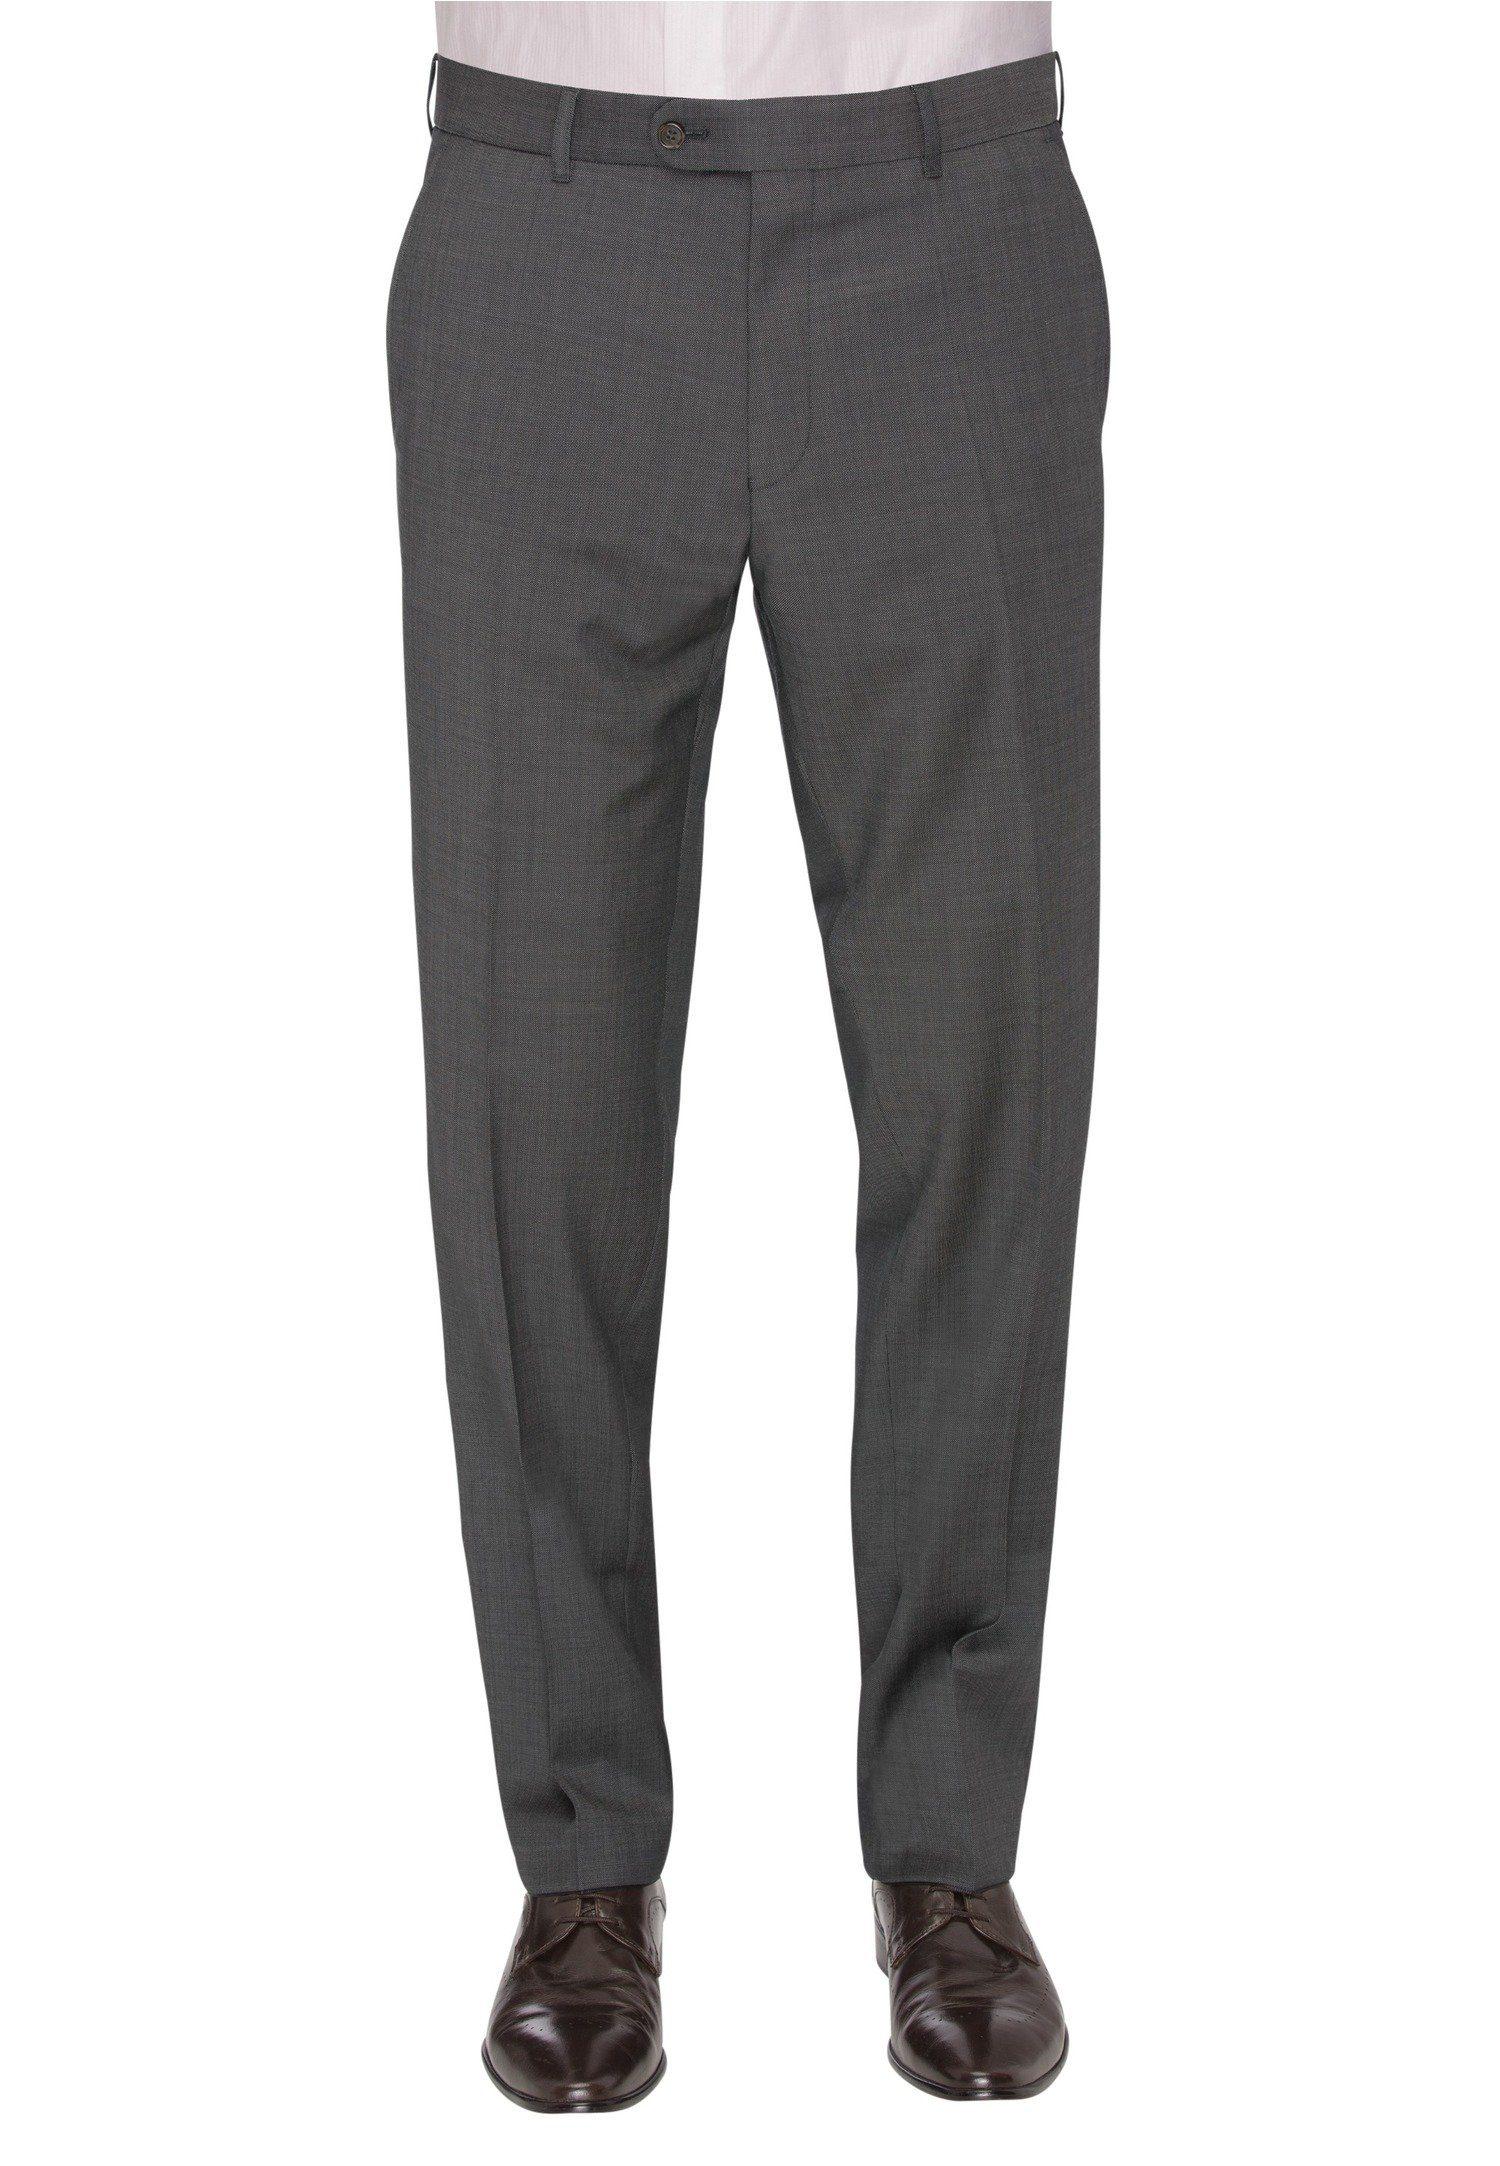 CARL GROSS Anzughose CG Silvio_C | Bekleidung > Hosen > Anzughosen | Grau | Schurwolle - Viskose | Carl Gross